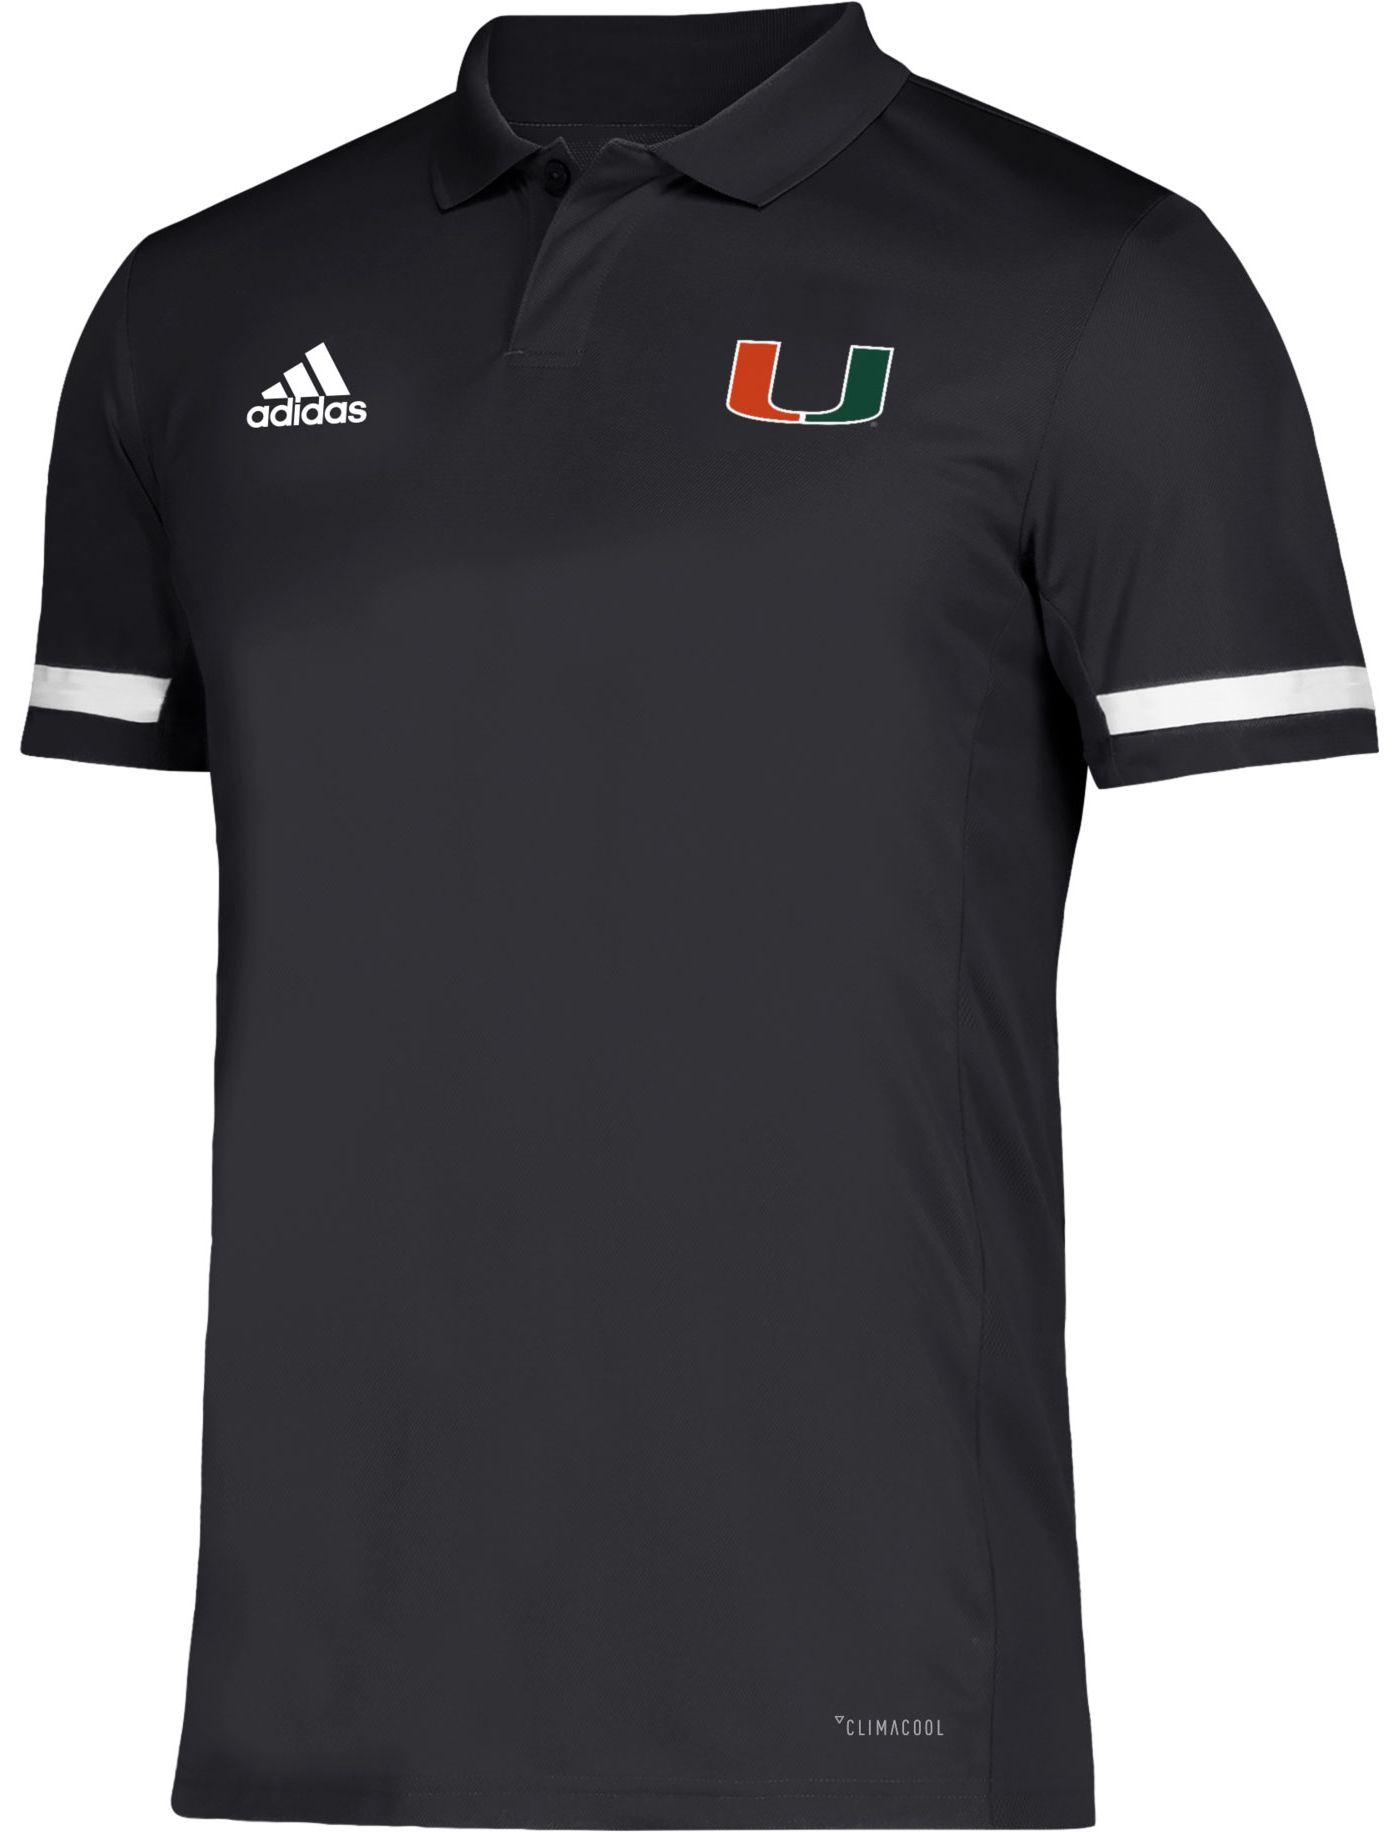 adidas Men's Miami Hurricanes Team 19 Sideline Football Black Polo